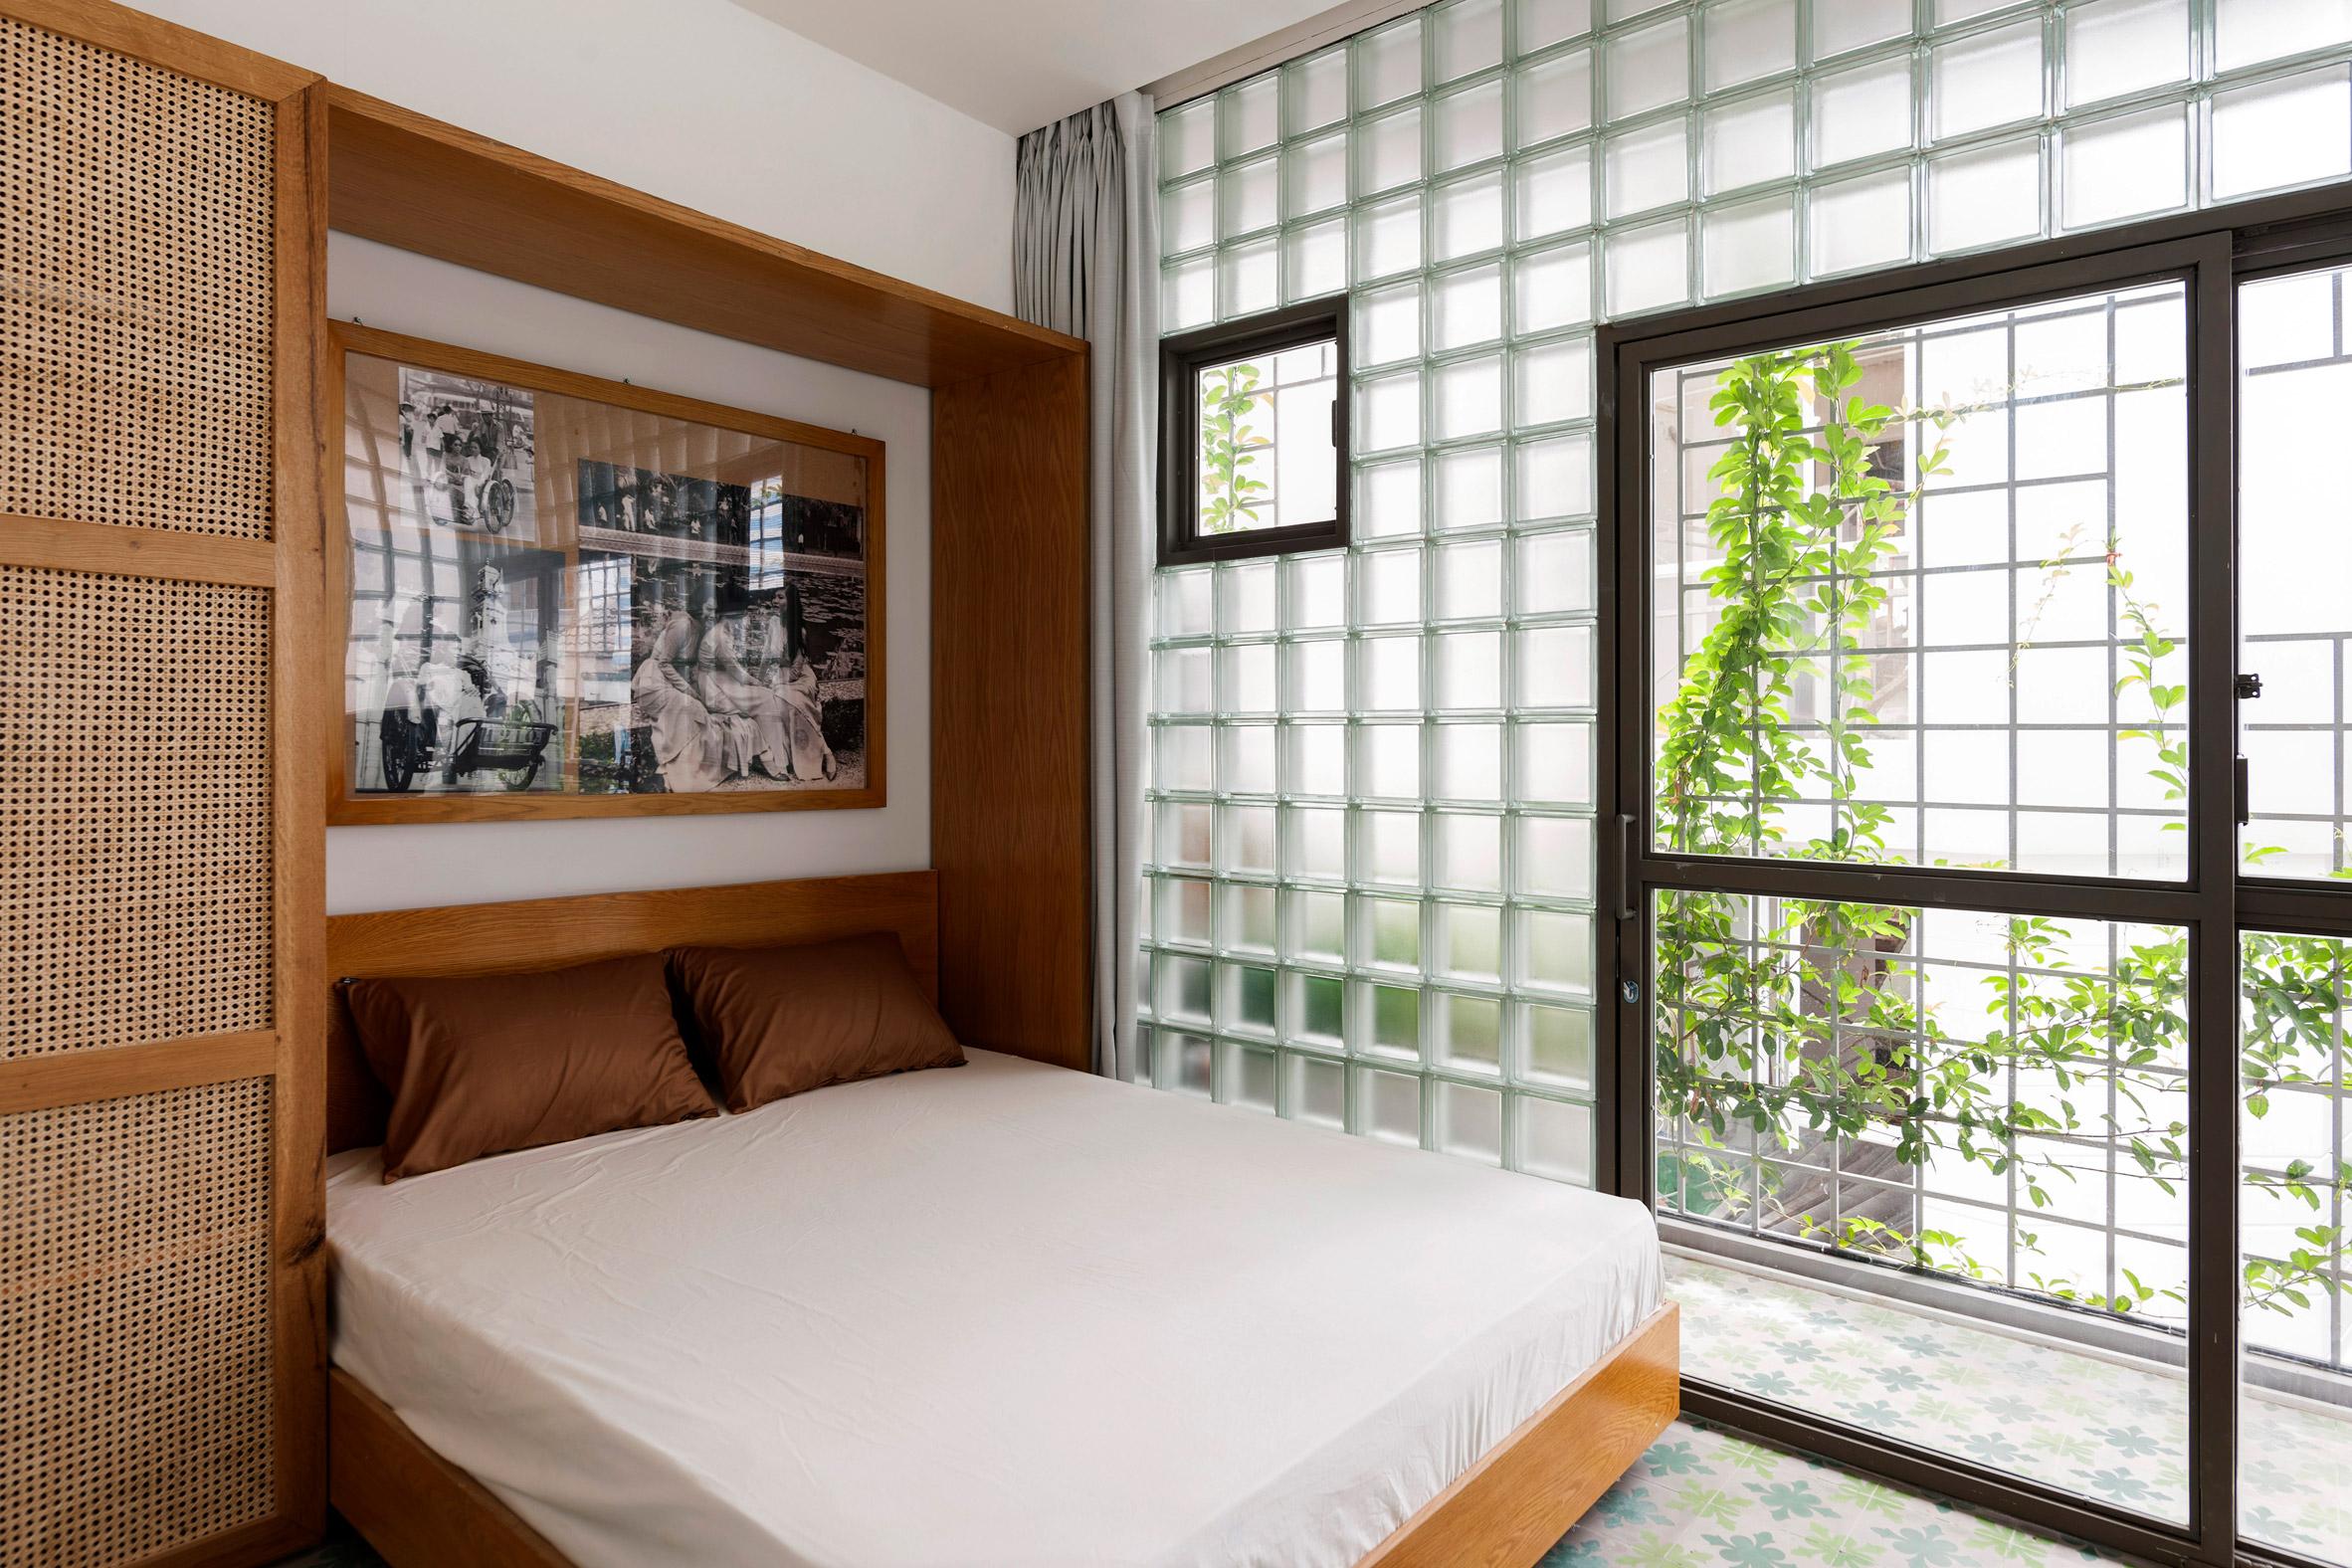 Master bedroom has glass brick walls